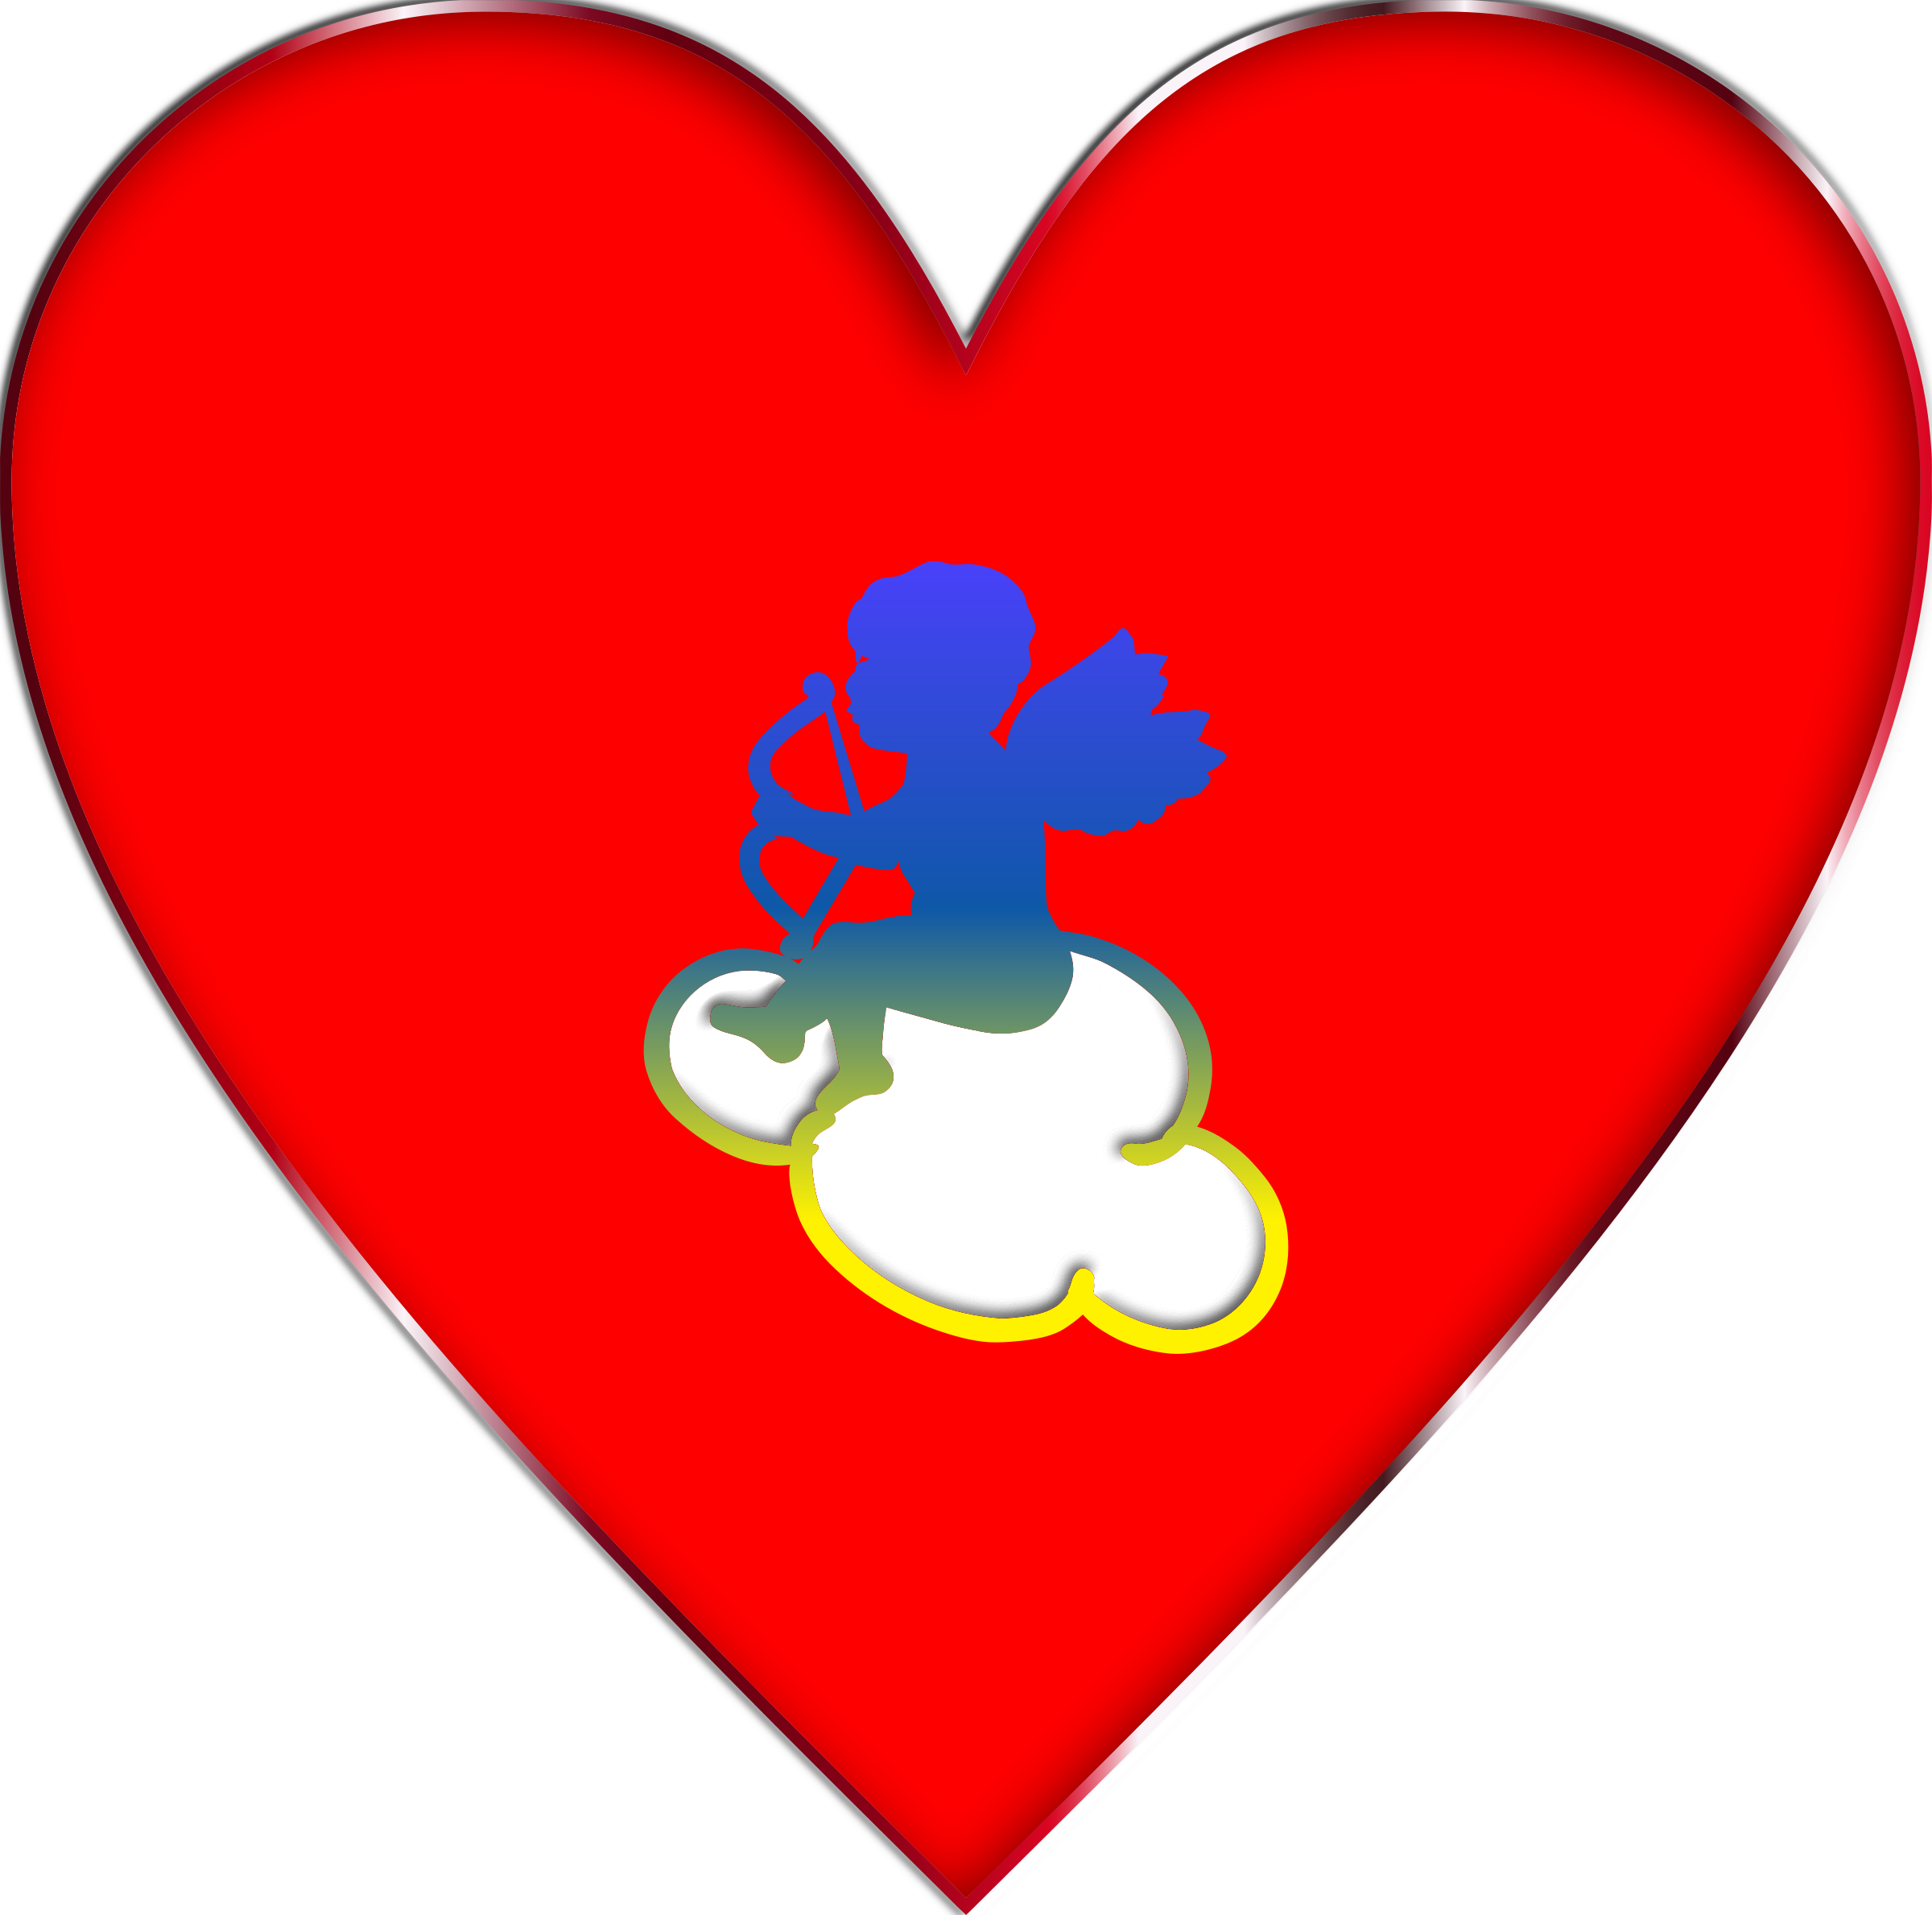 Cloud clipart heart. Cupid enhanced big image